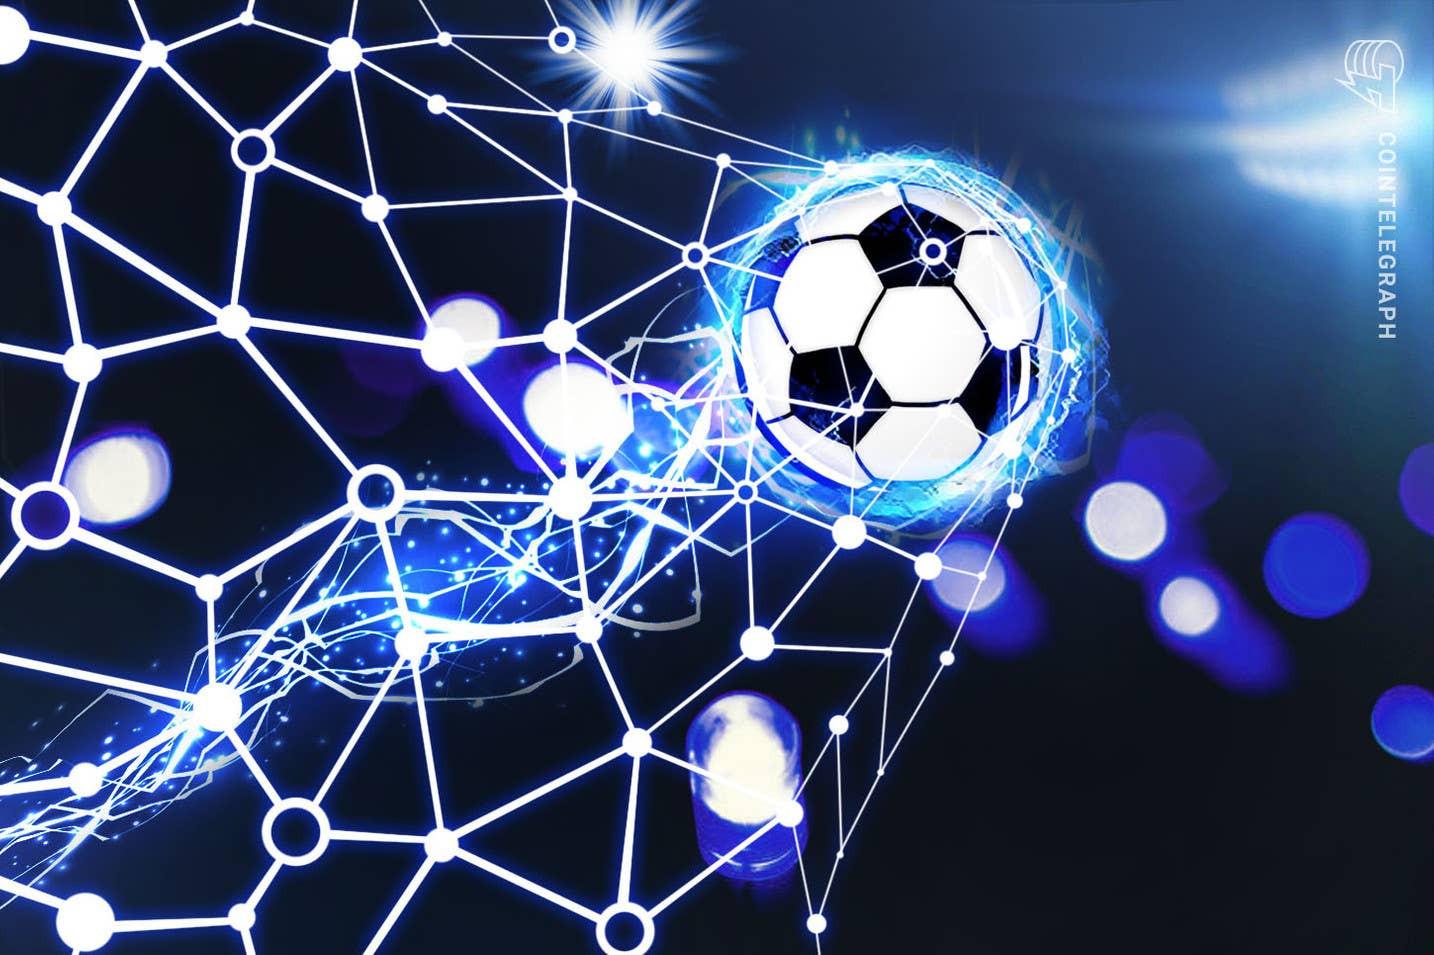 Exchange brasileira Mercado Bitcoin vai patrocinar transmissão da UEFA Champions League